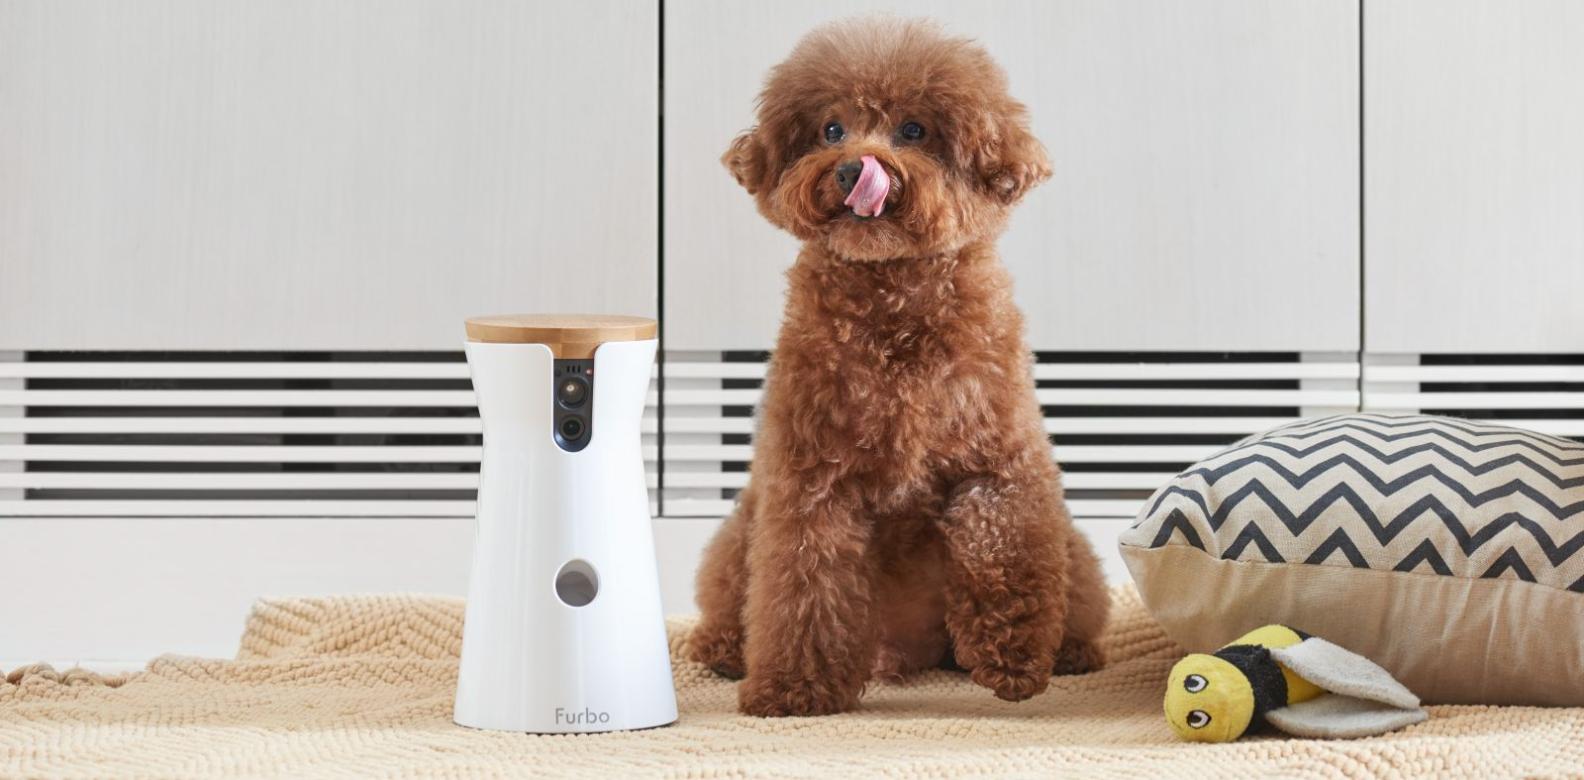 Pet Tech: 5 Clever Gadgets For Your Furry Friend